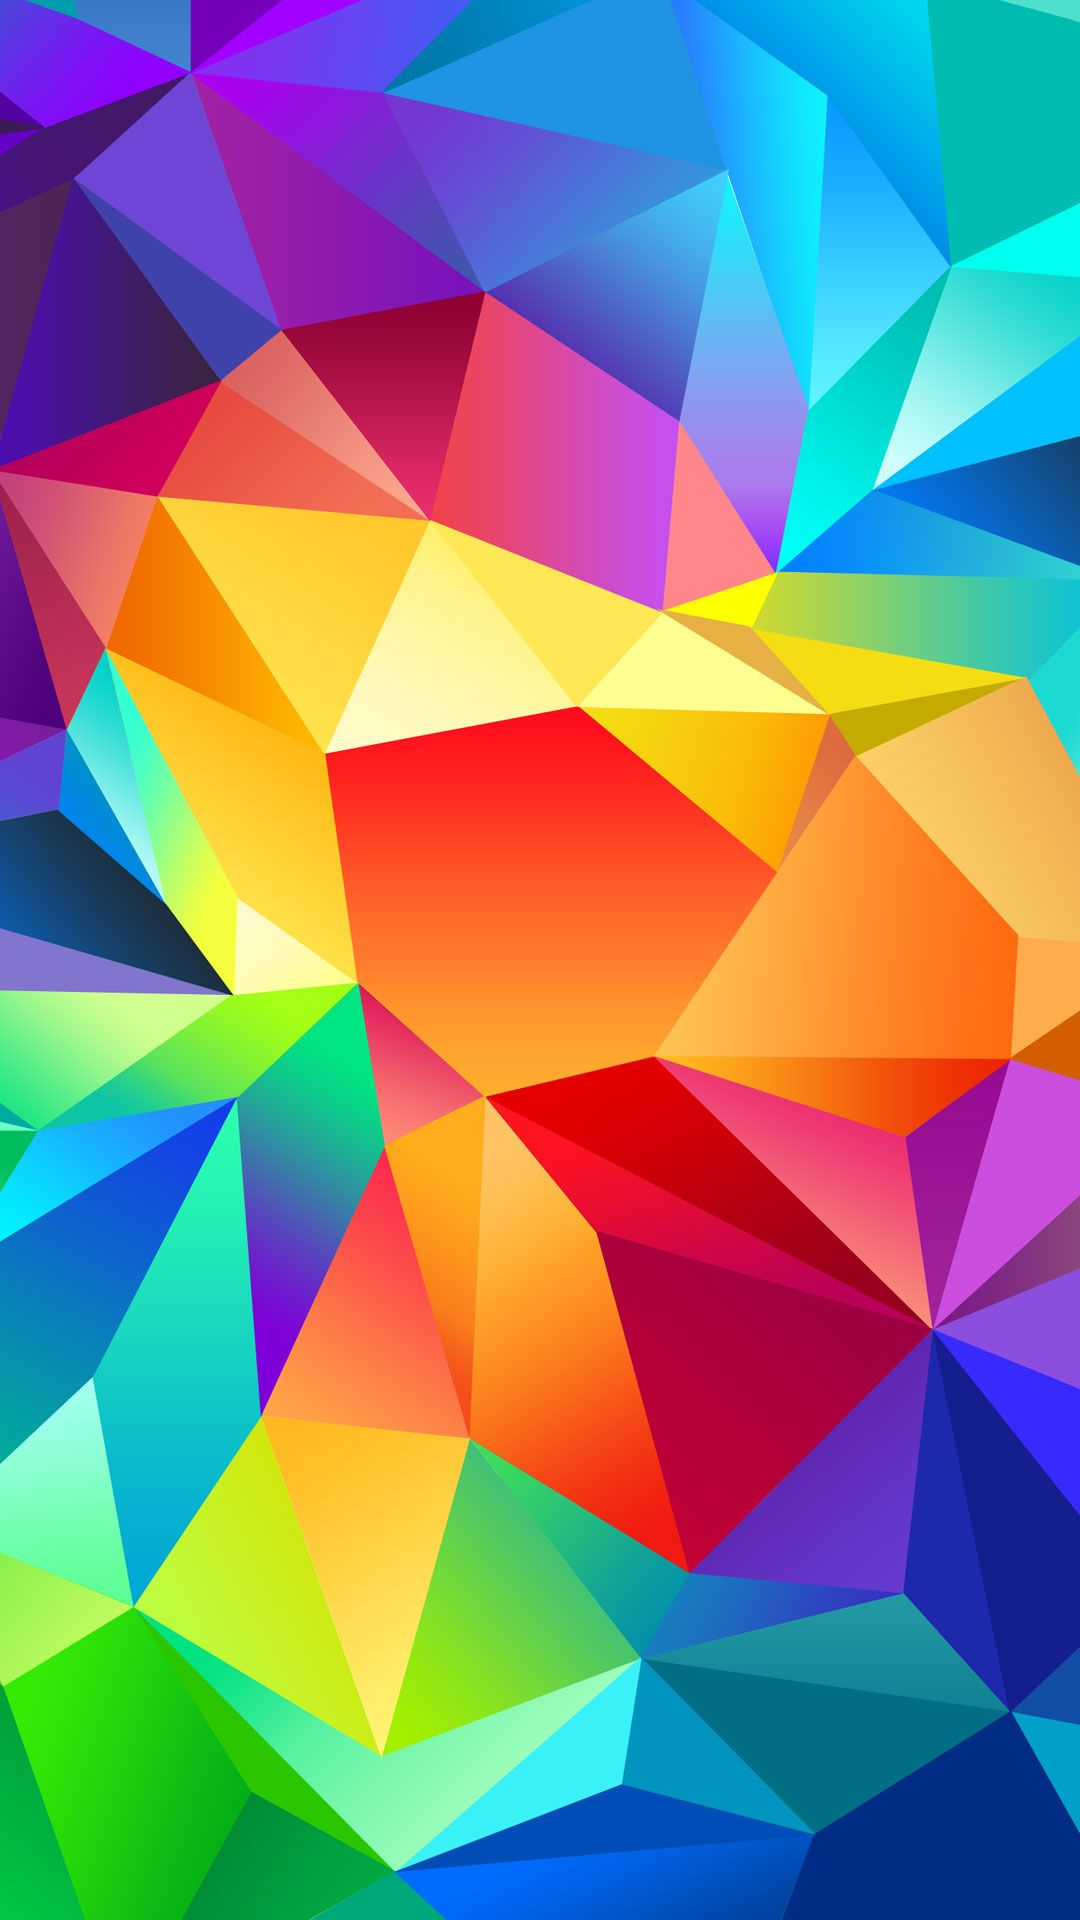 Colorful Apple Background Image Fresh Wallpapers Ideas In 2020 Galaxy Tab S Samsung Galaxy Tab S Samsung Galaxy Tab